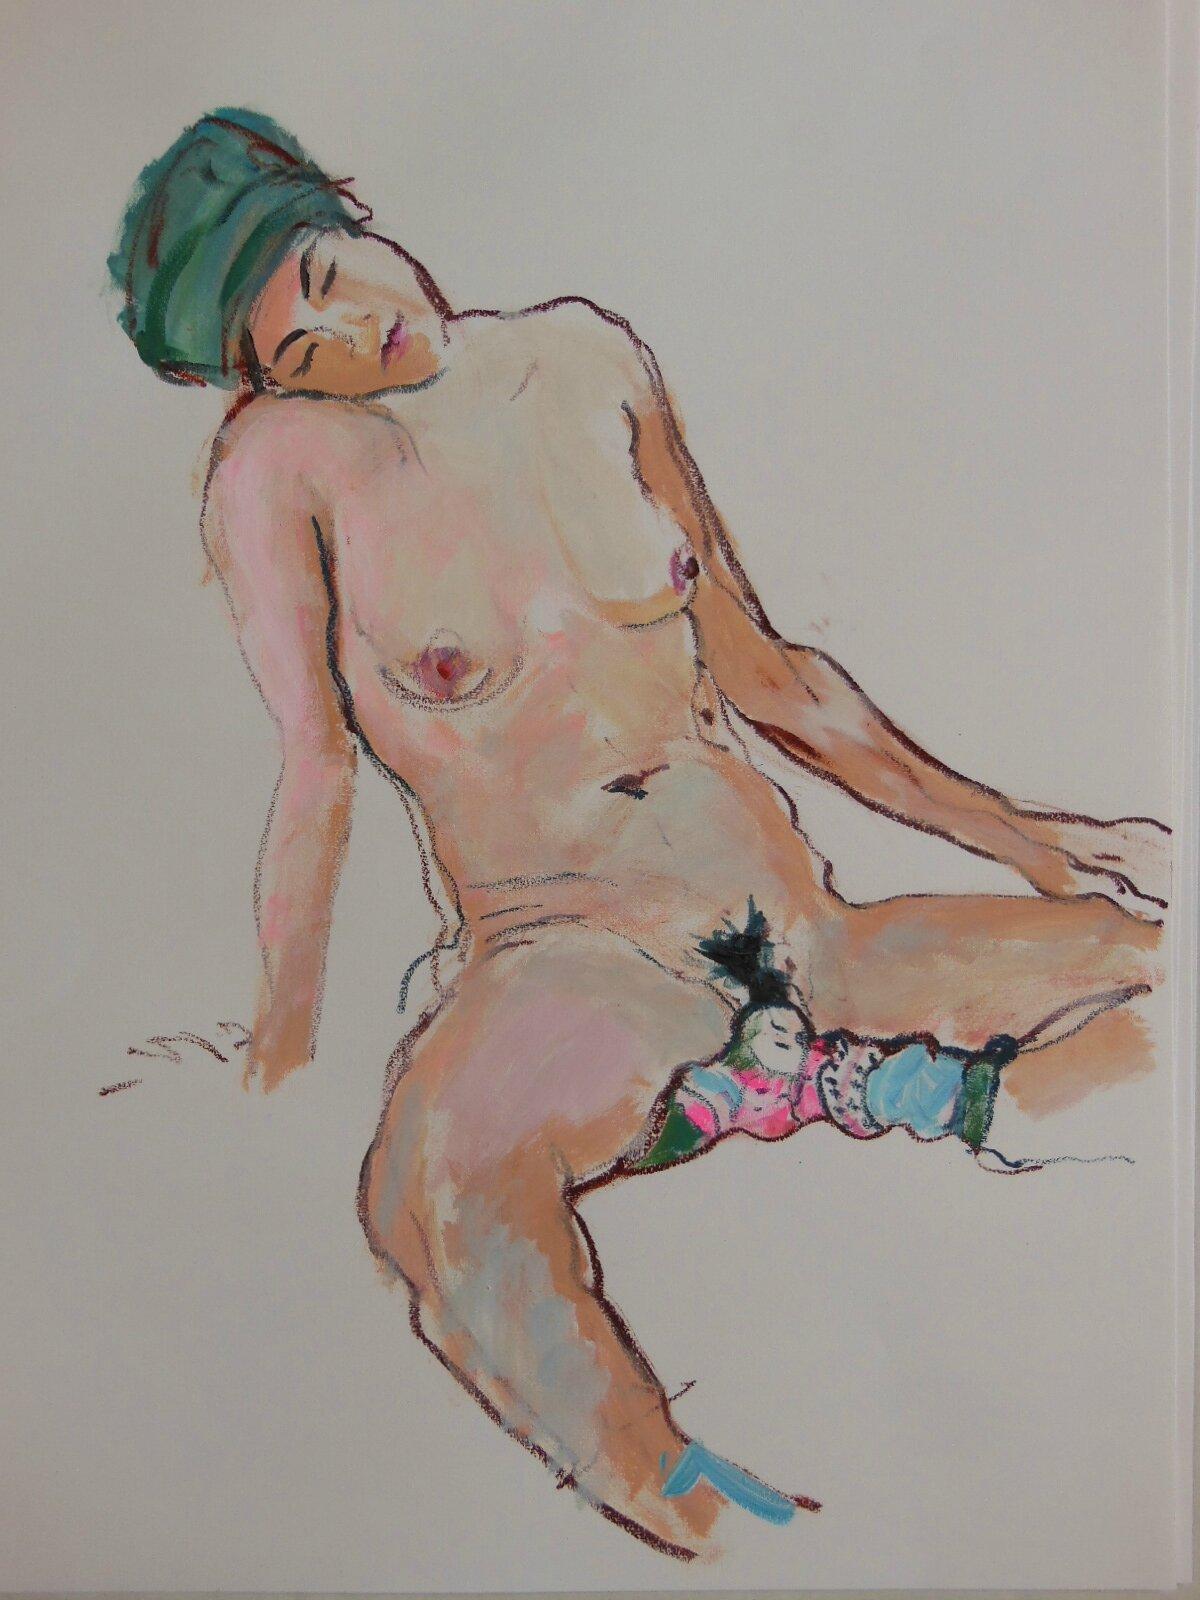 dessin peinture tableau de nu beaux art (8)